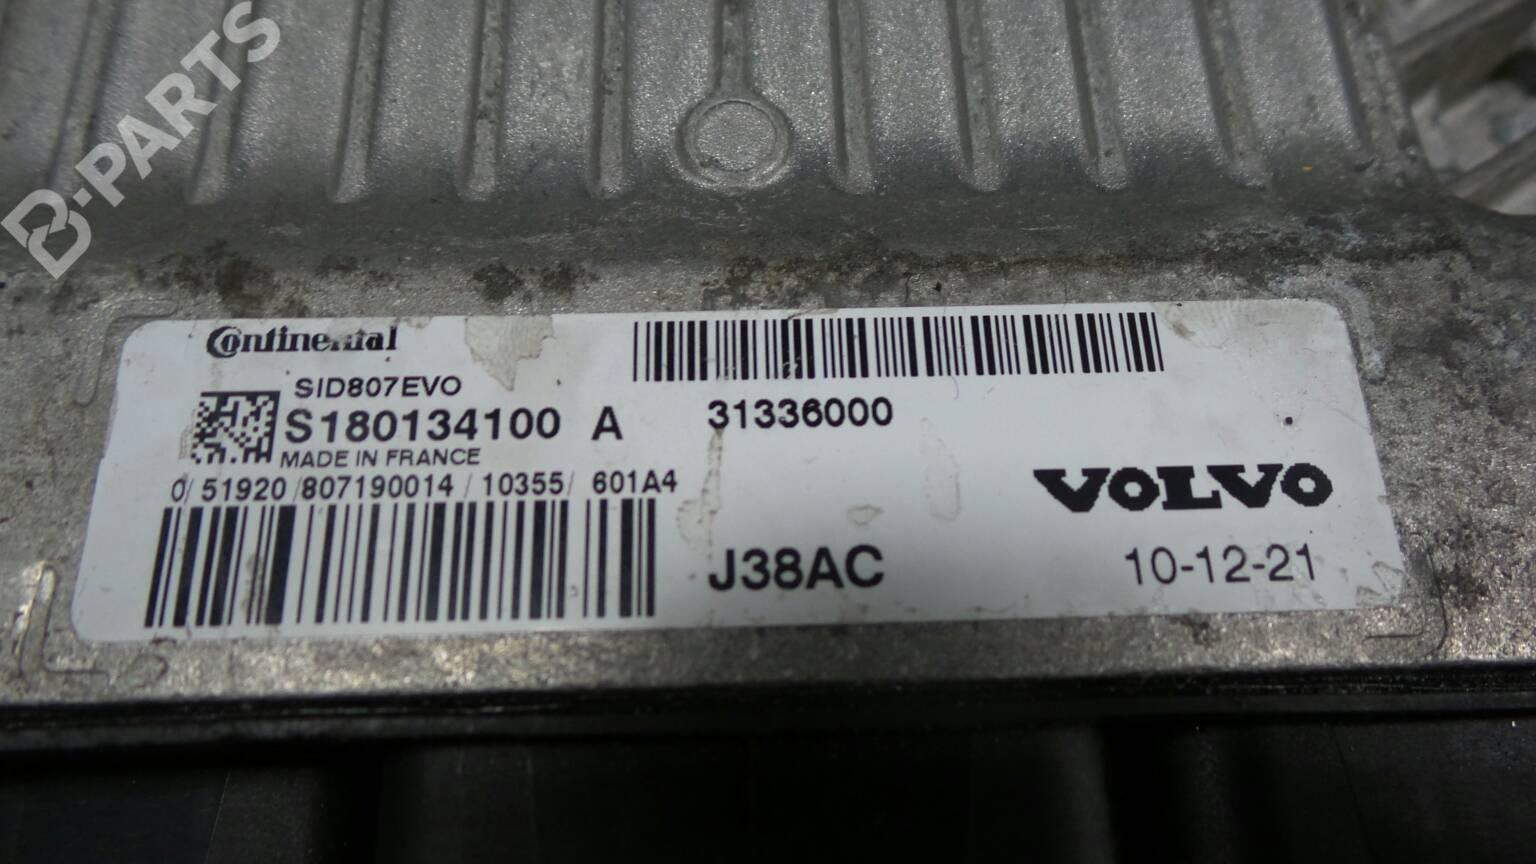 Engine Control Unit Ecu Volvo C30 533 16 D 35729 Fuse Box 31 336 000 S180134100 109hp